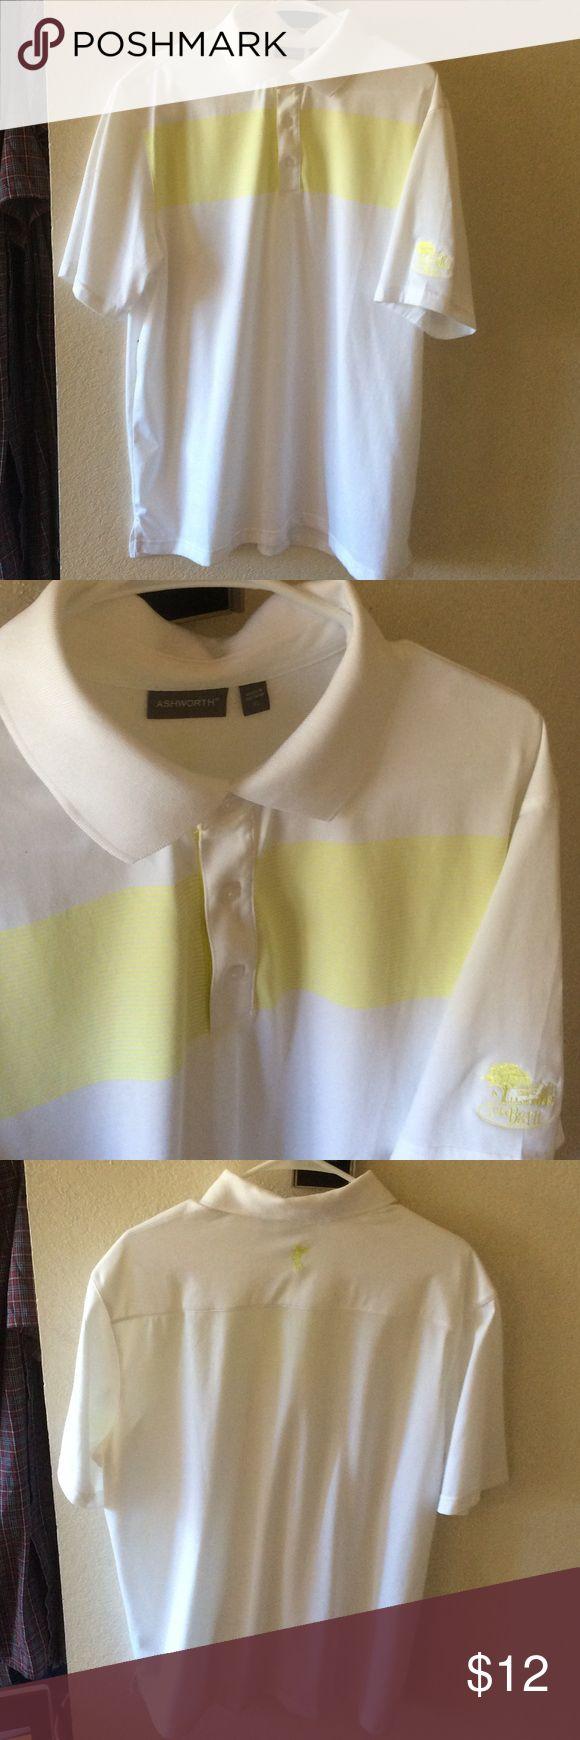 Men's Ashworth Golf Shirt sz XL.  NEW Never worn. Embroidery on sleeve Ashworth Shirts Polos